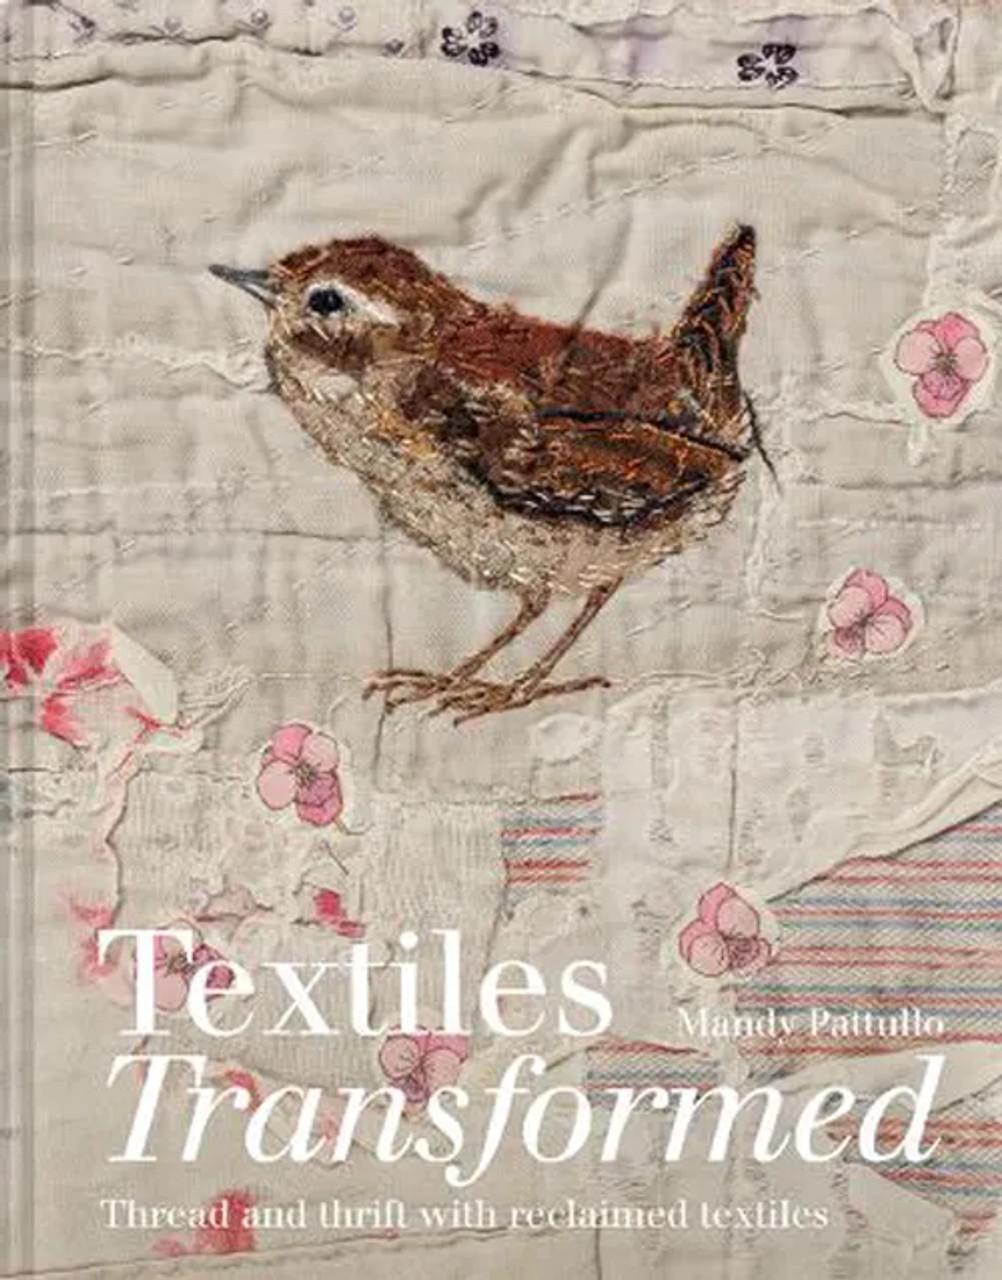 Textiles Transformed - Mandy Pattullo